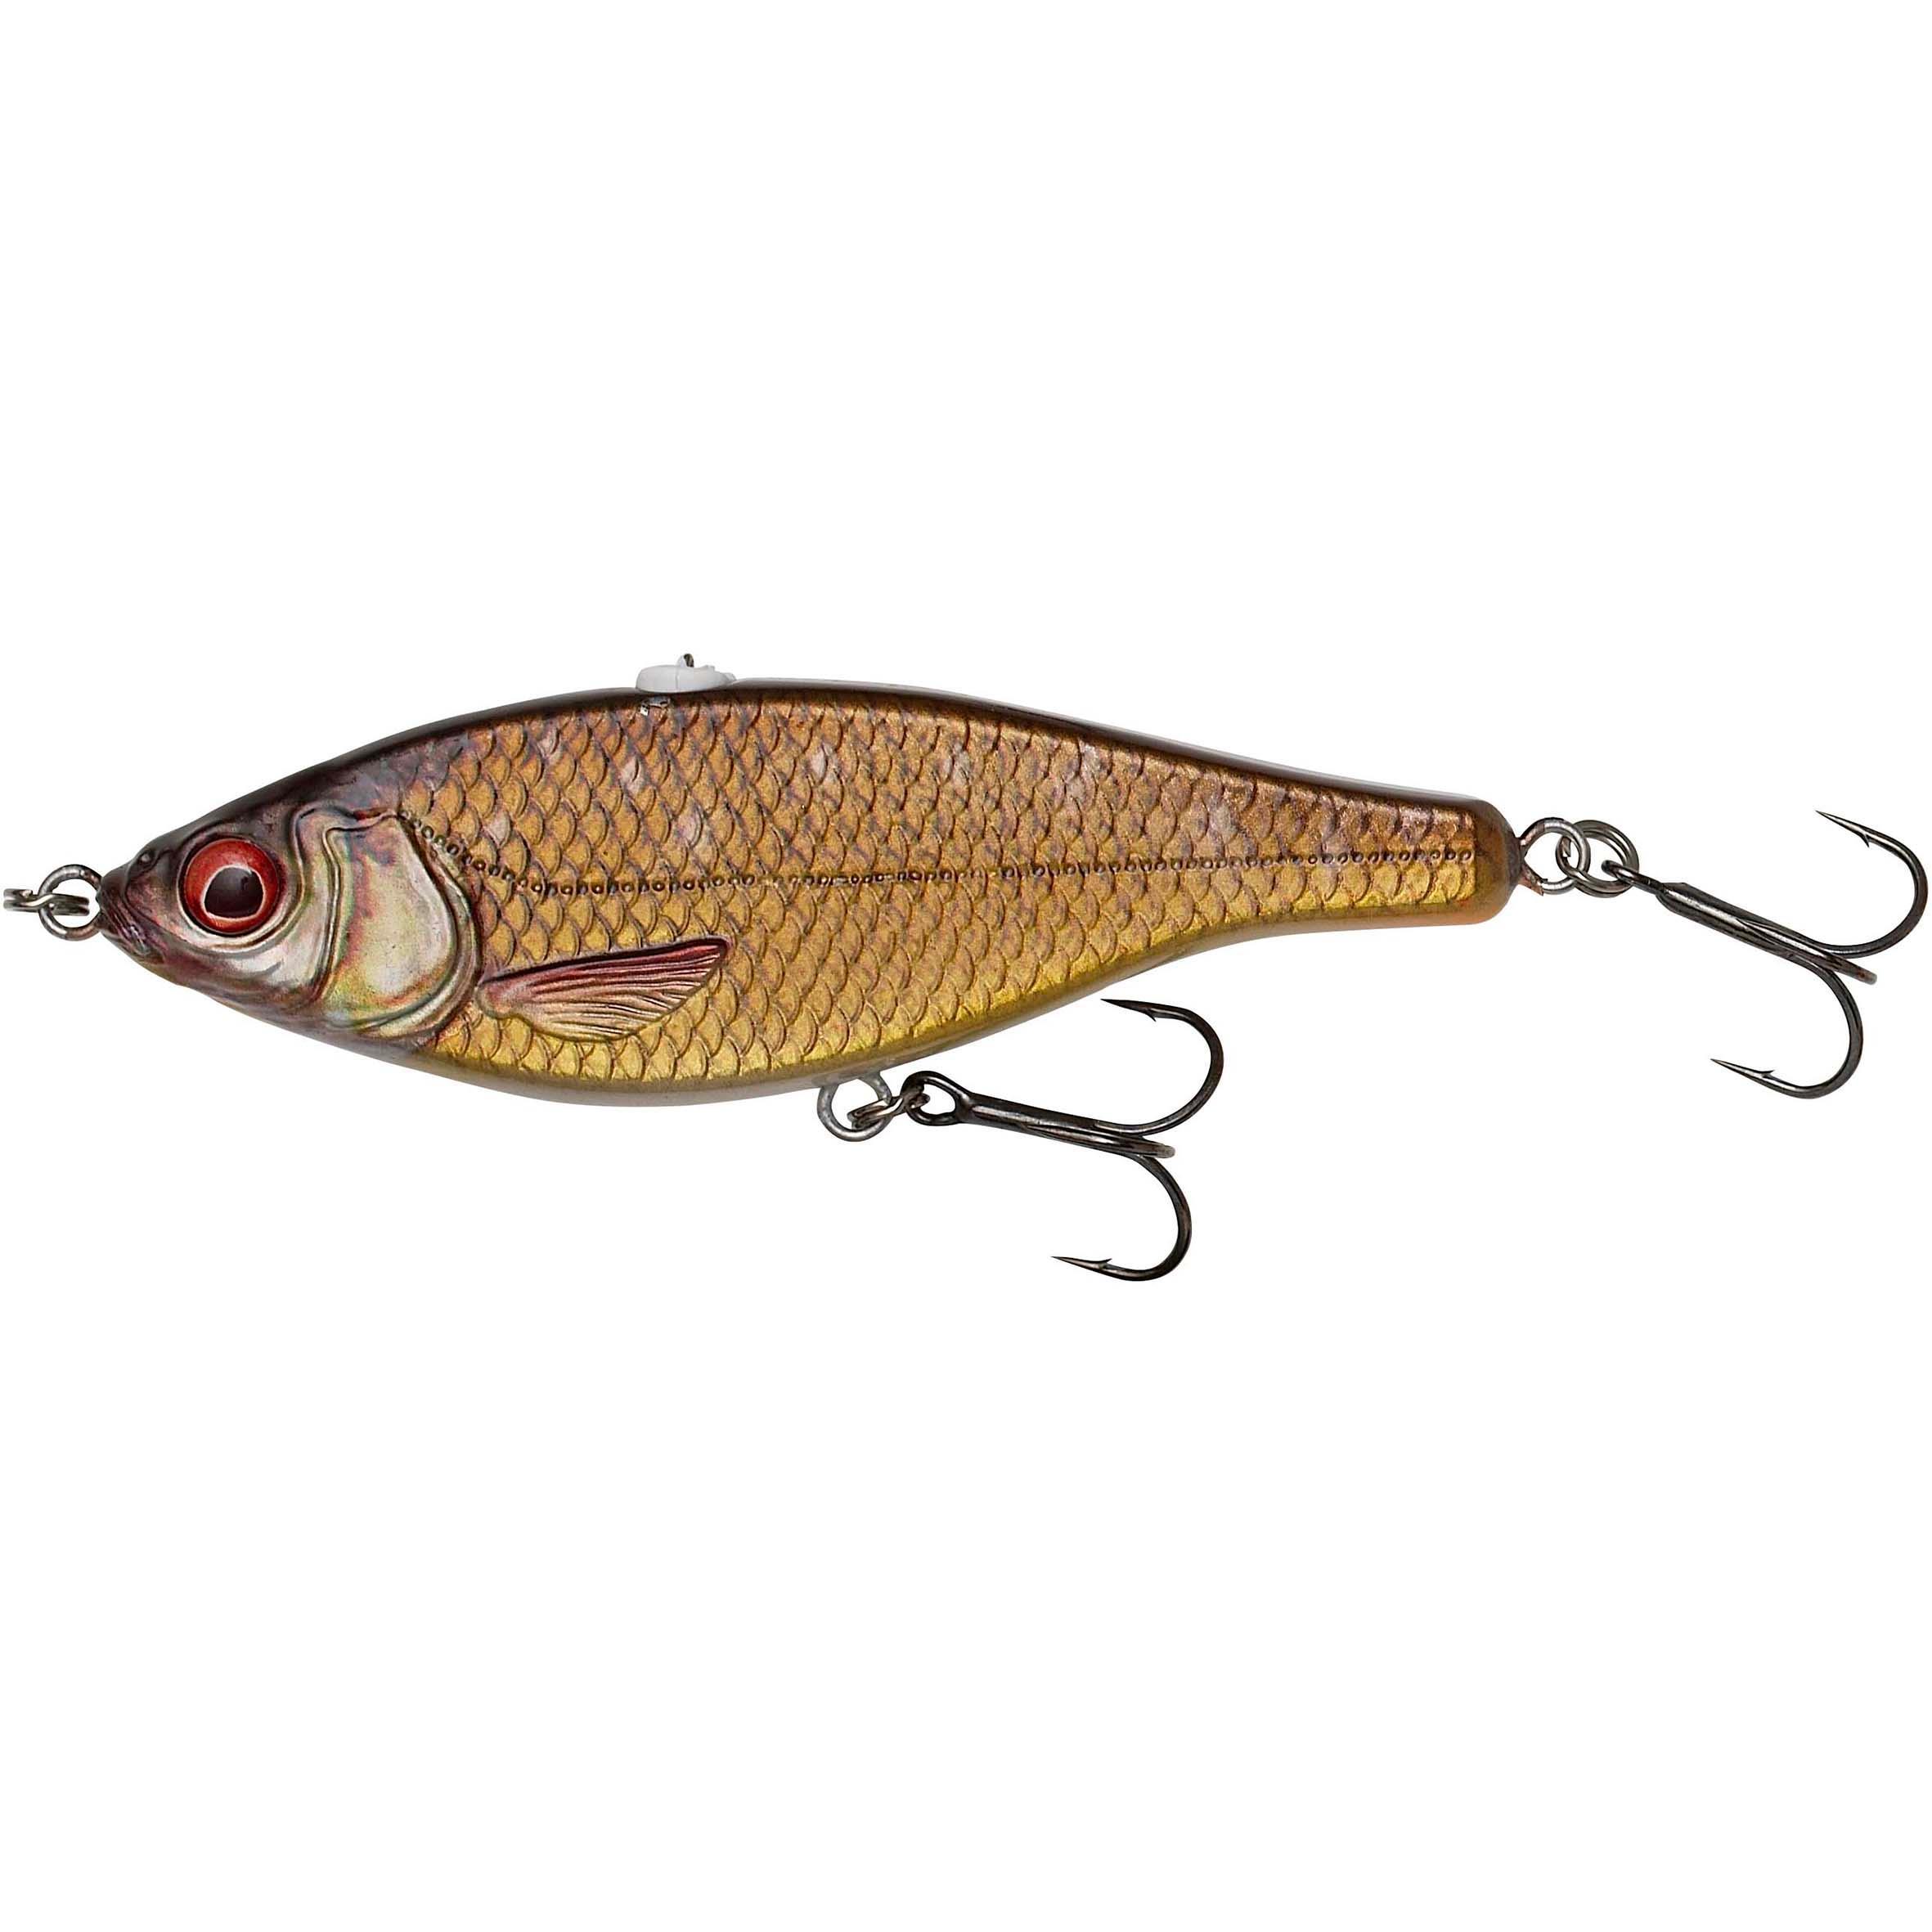 savage gear minnow pesca artificiali luccio 3d roach jerkster - 14.5 gf